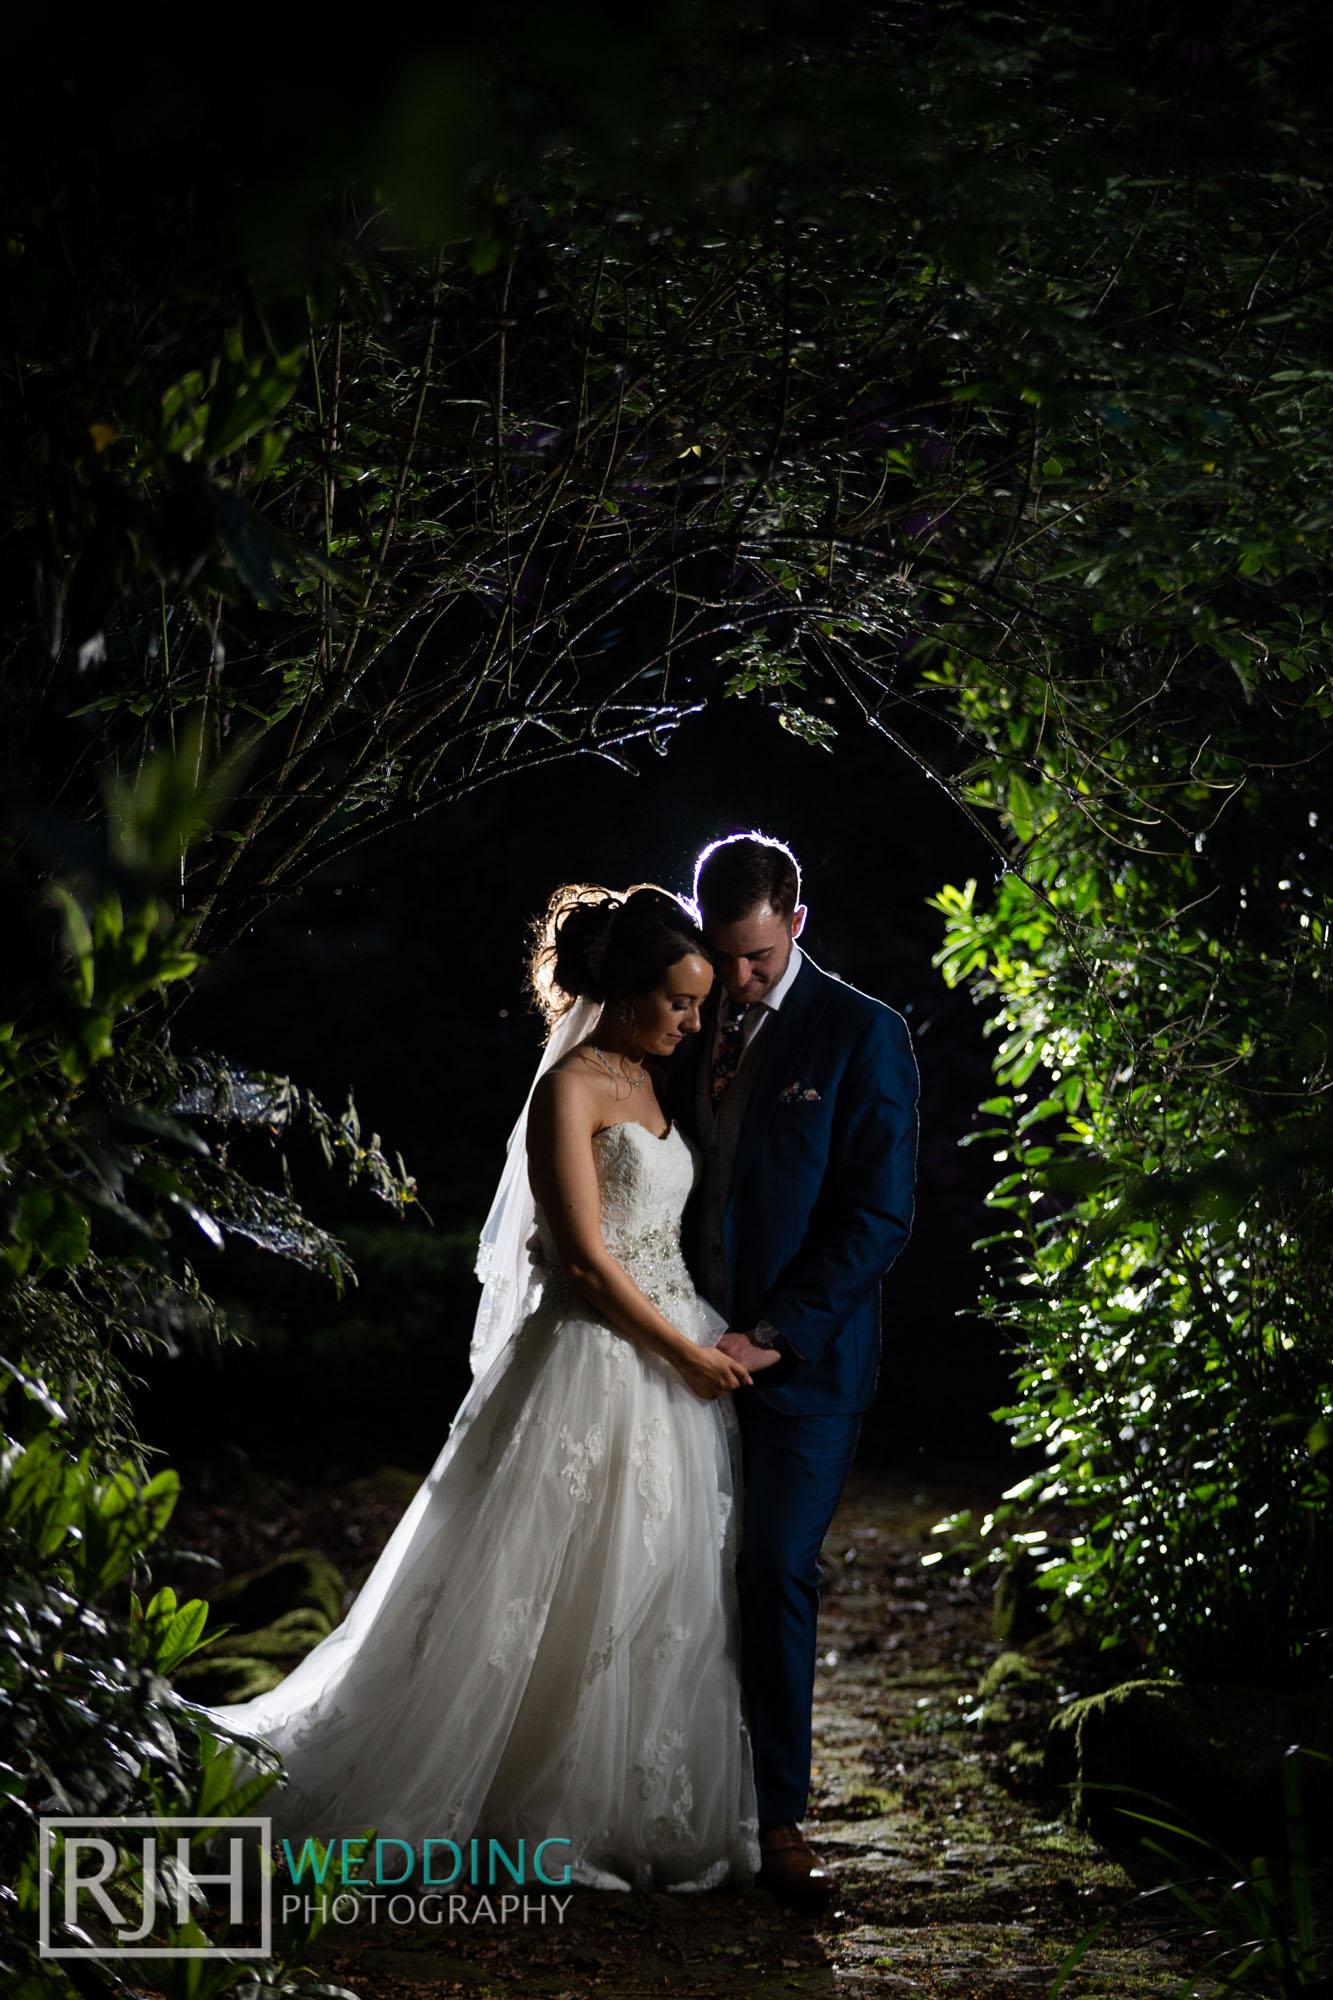 Whirlowbrook Hall Wedding Photography_Jack & Lydia_071_IMG_4953.jpg